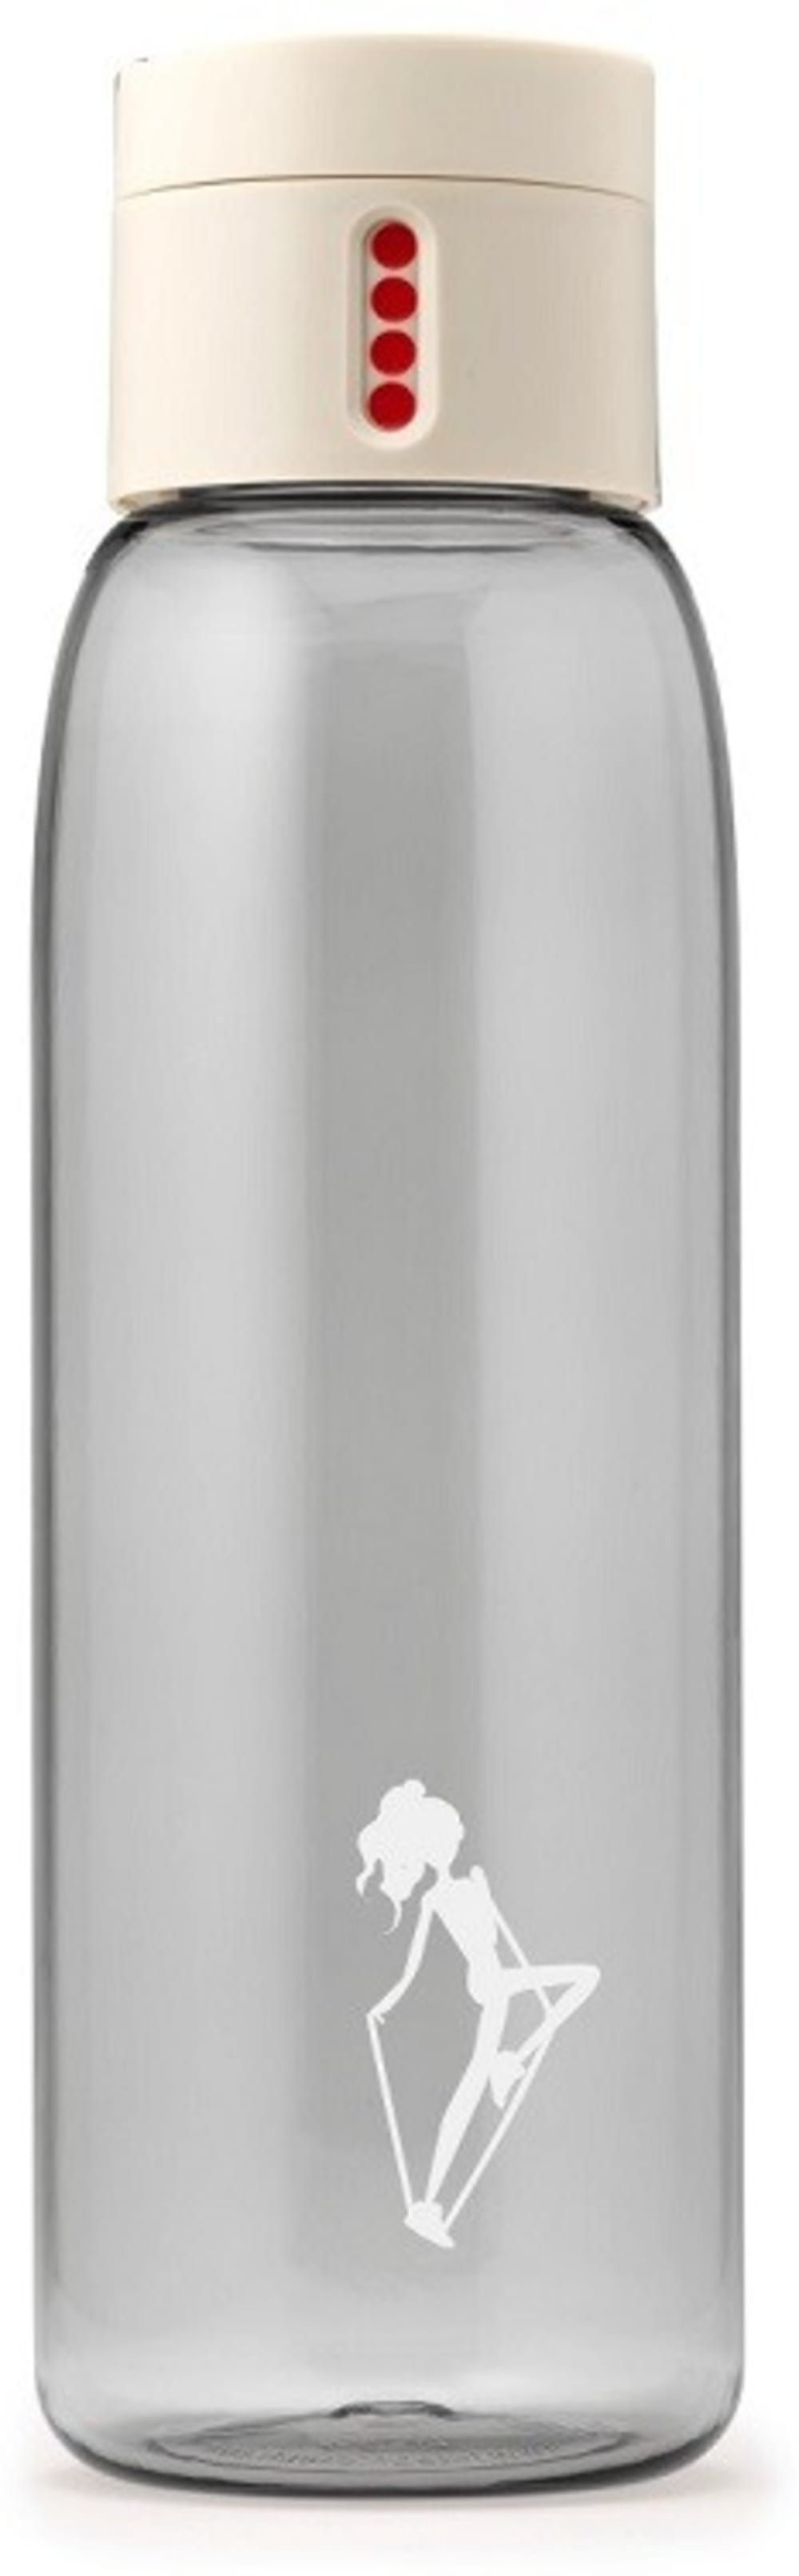 Butelka na wodę z licznikiem mini ANNA LEWANDOWSKA